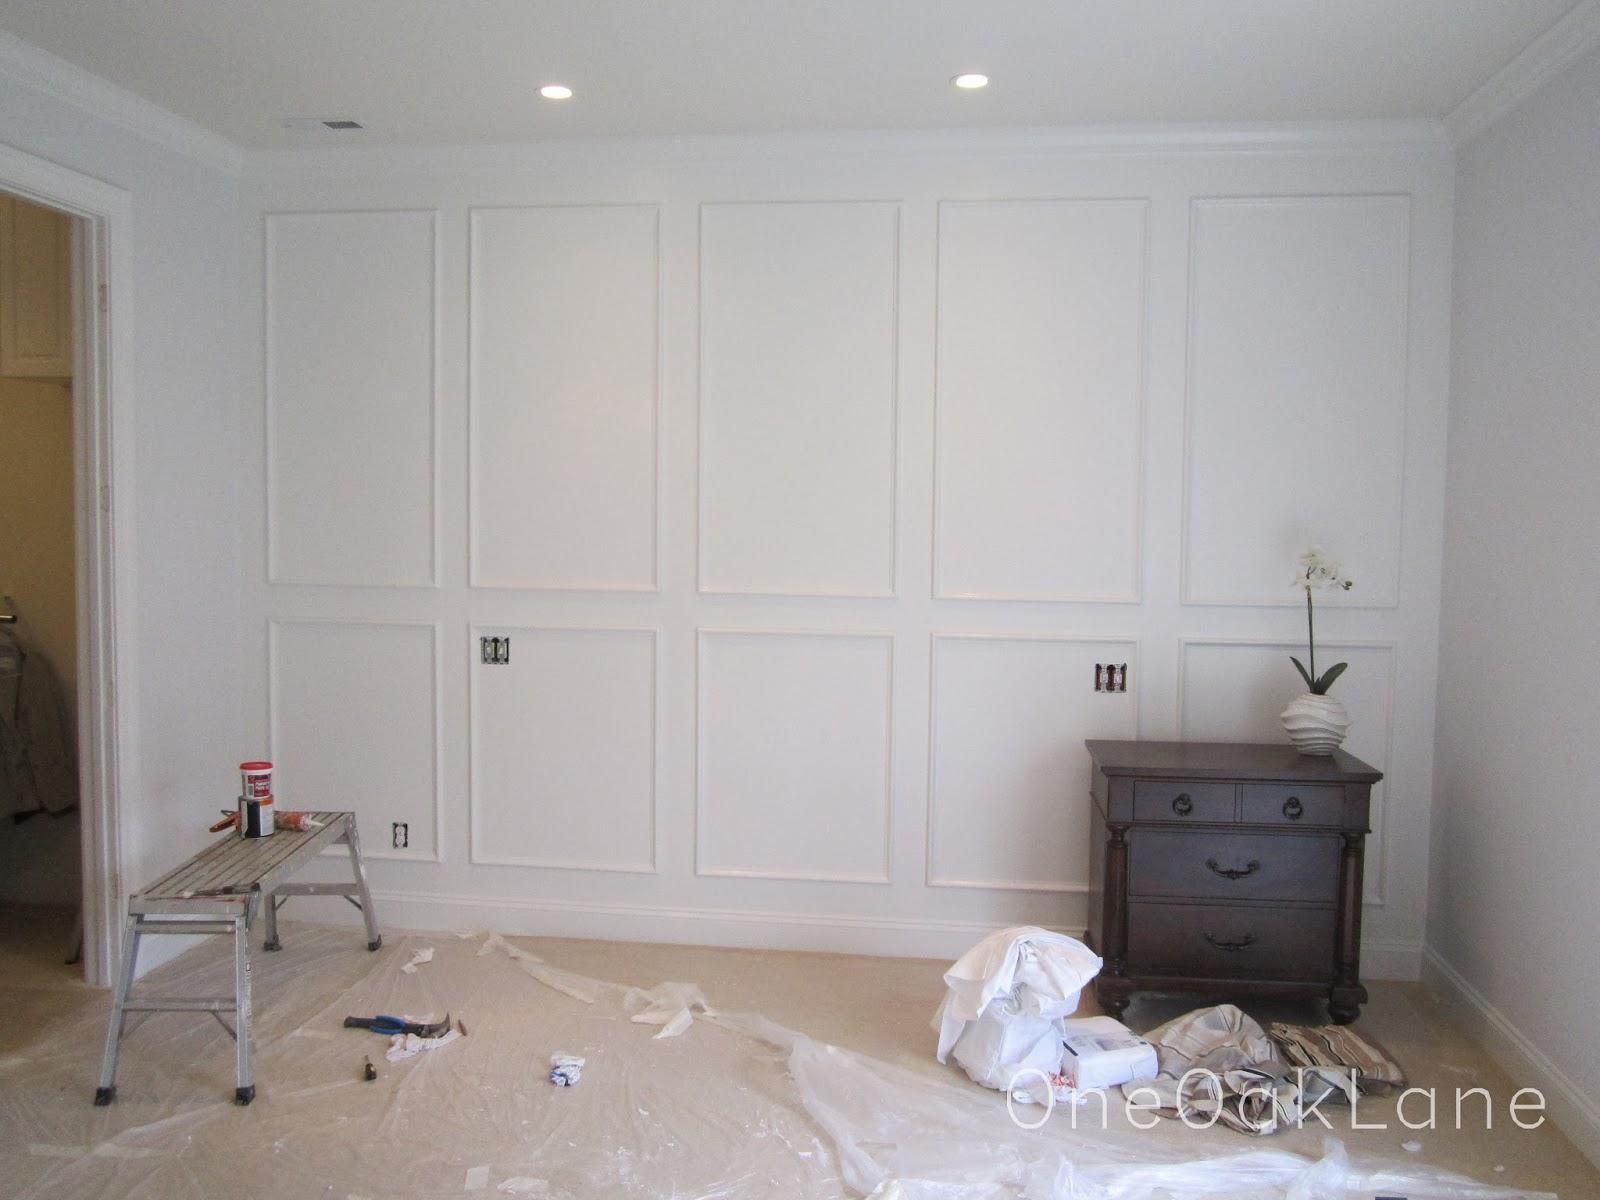 Molding ideas for walls - Molding Ideas For Walls 47